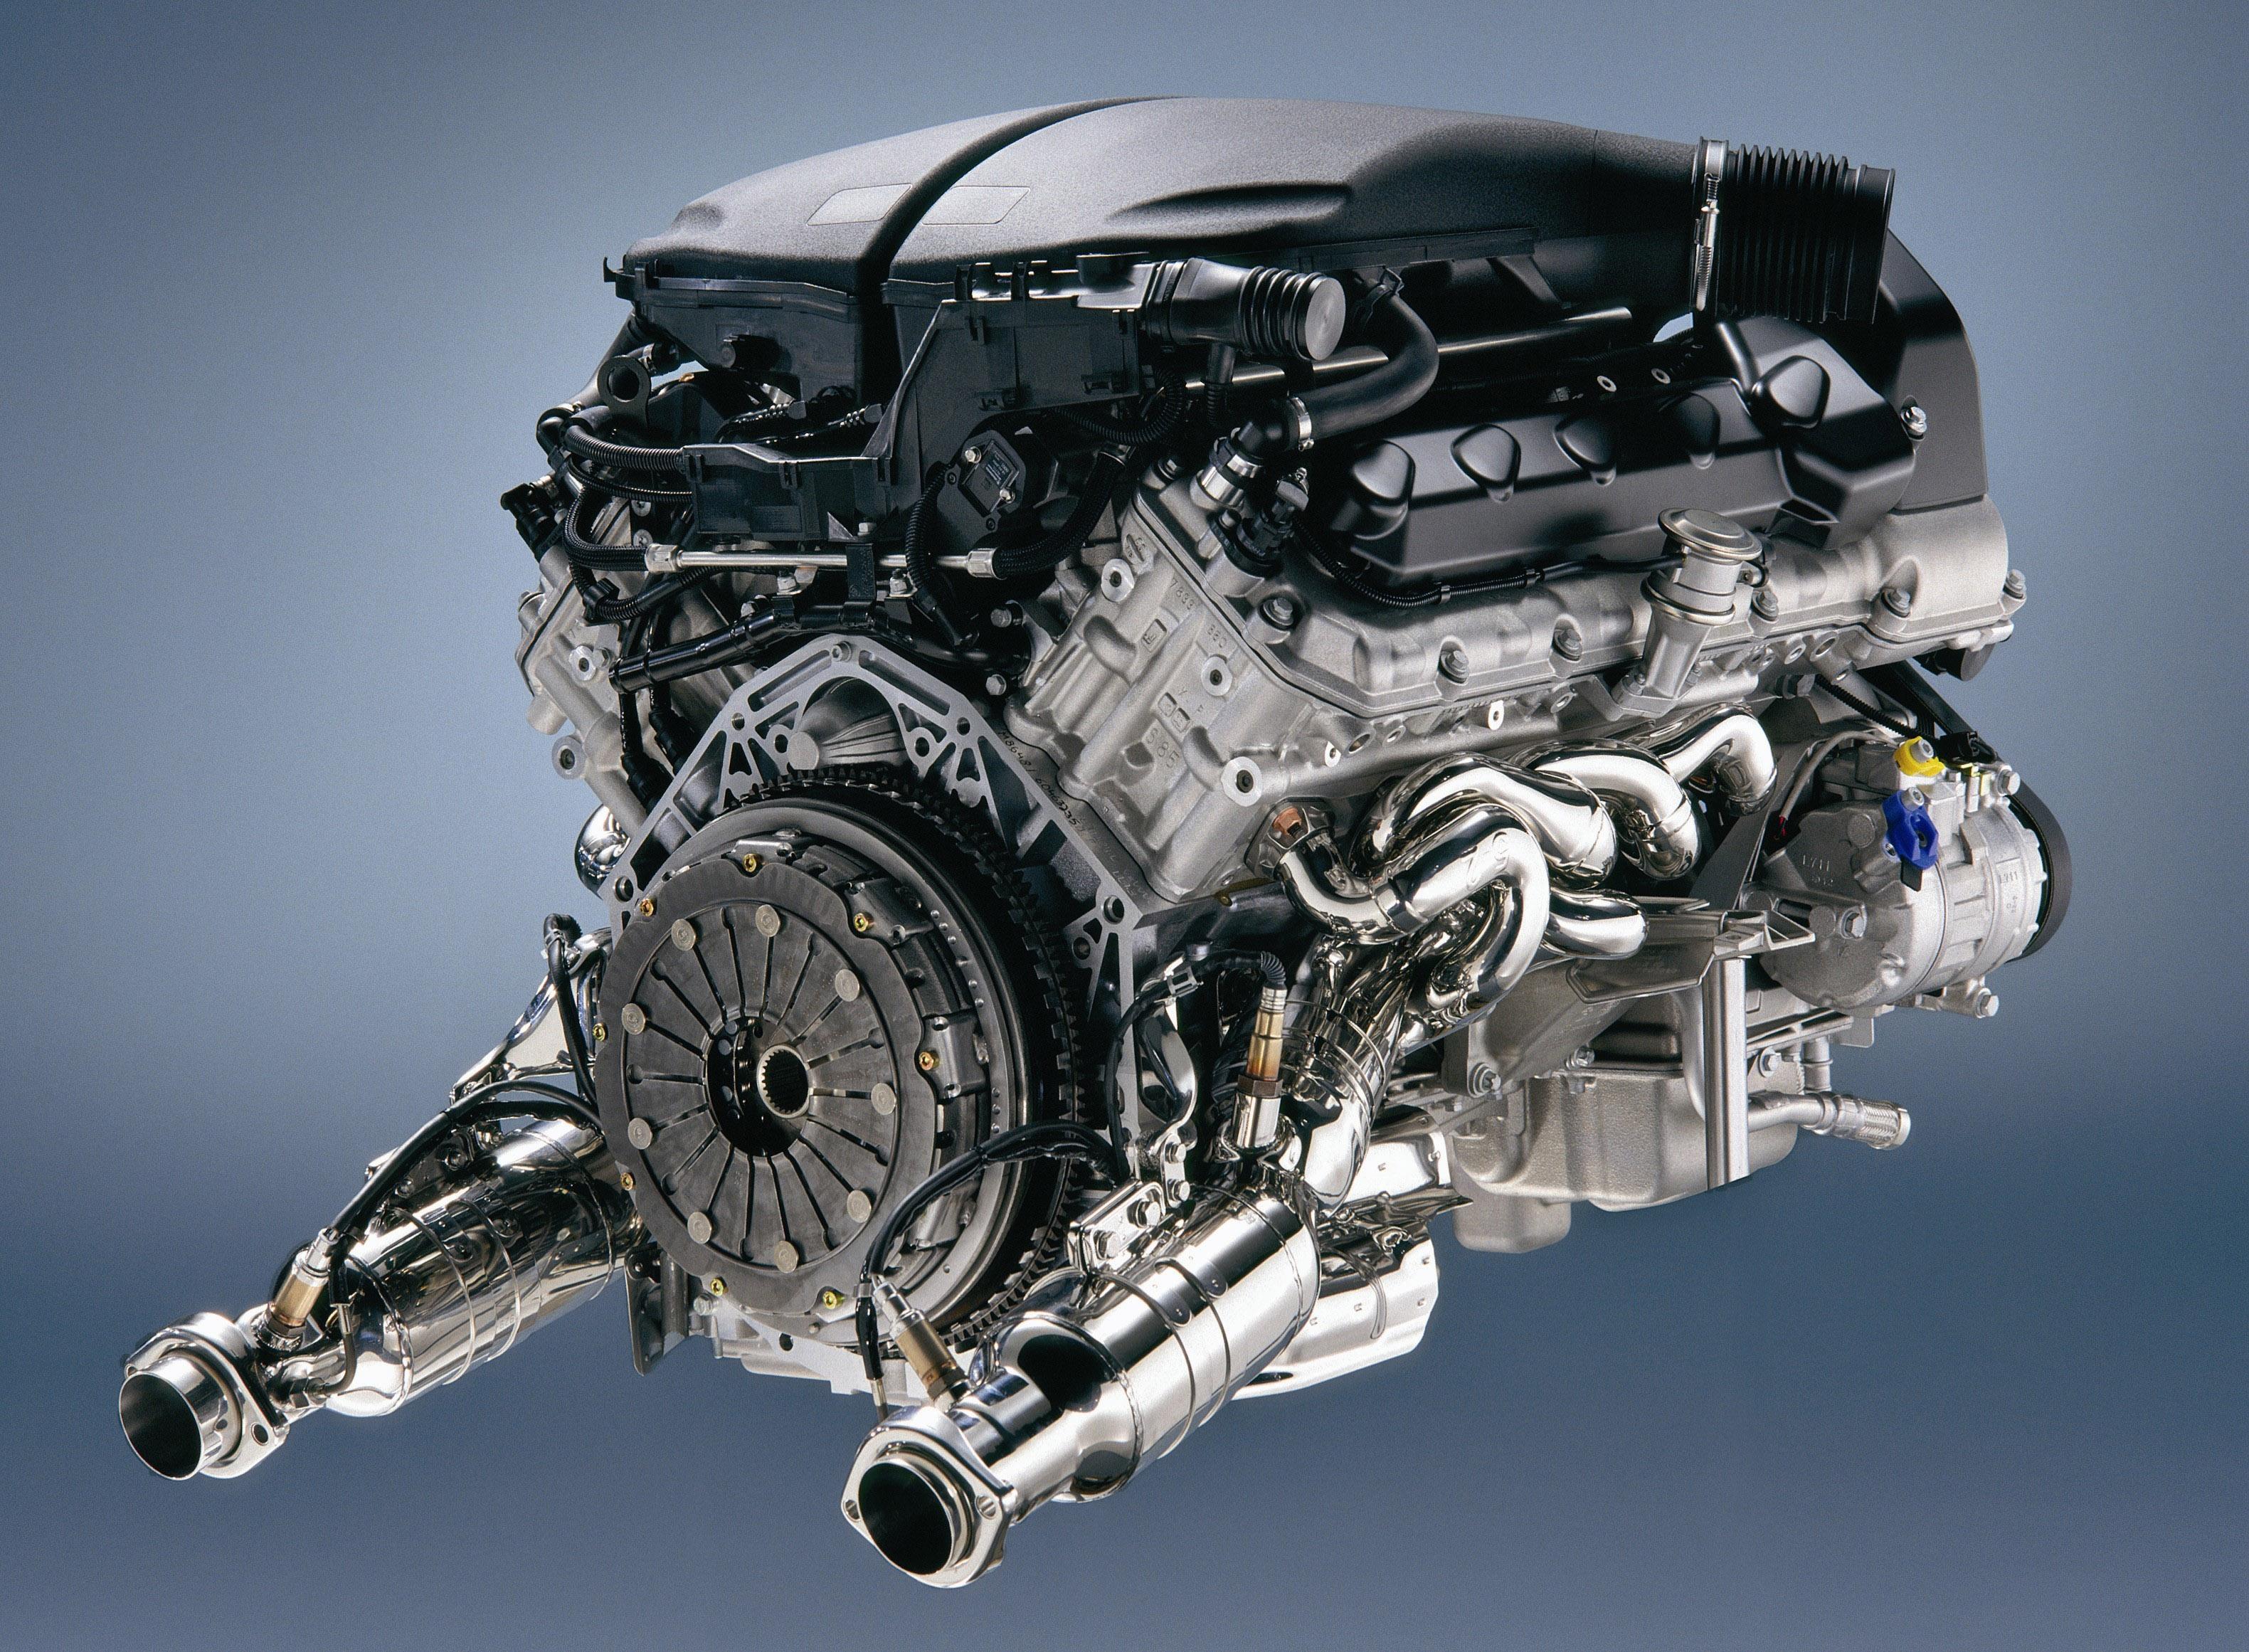 f1 engine wallpaper - photo #32